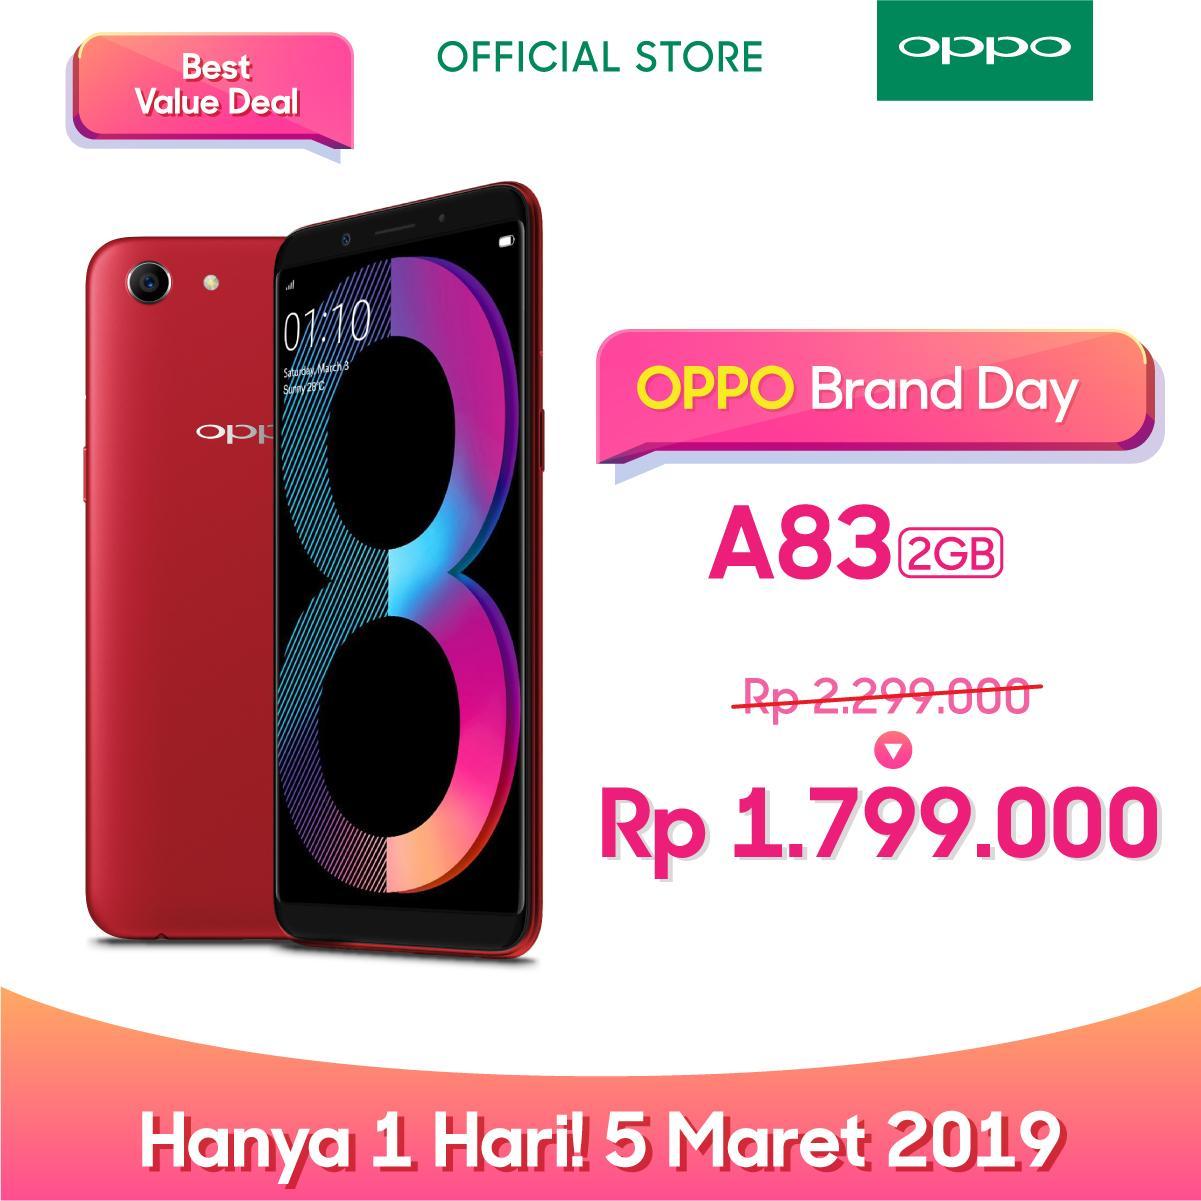 OPPO A83 SMARTPHONE 2GB/16GB ( A.I Beauty, Face Unlock (COD, Garansi Resmi OPPO, Cicilan tanpa kartu kredit, Cicilan 0%, Gratis Ongkir)